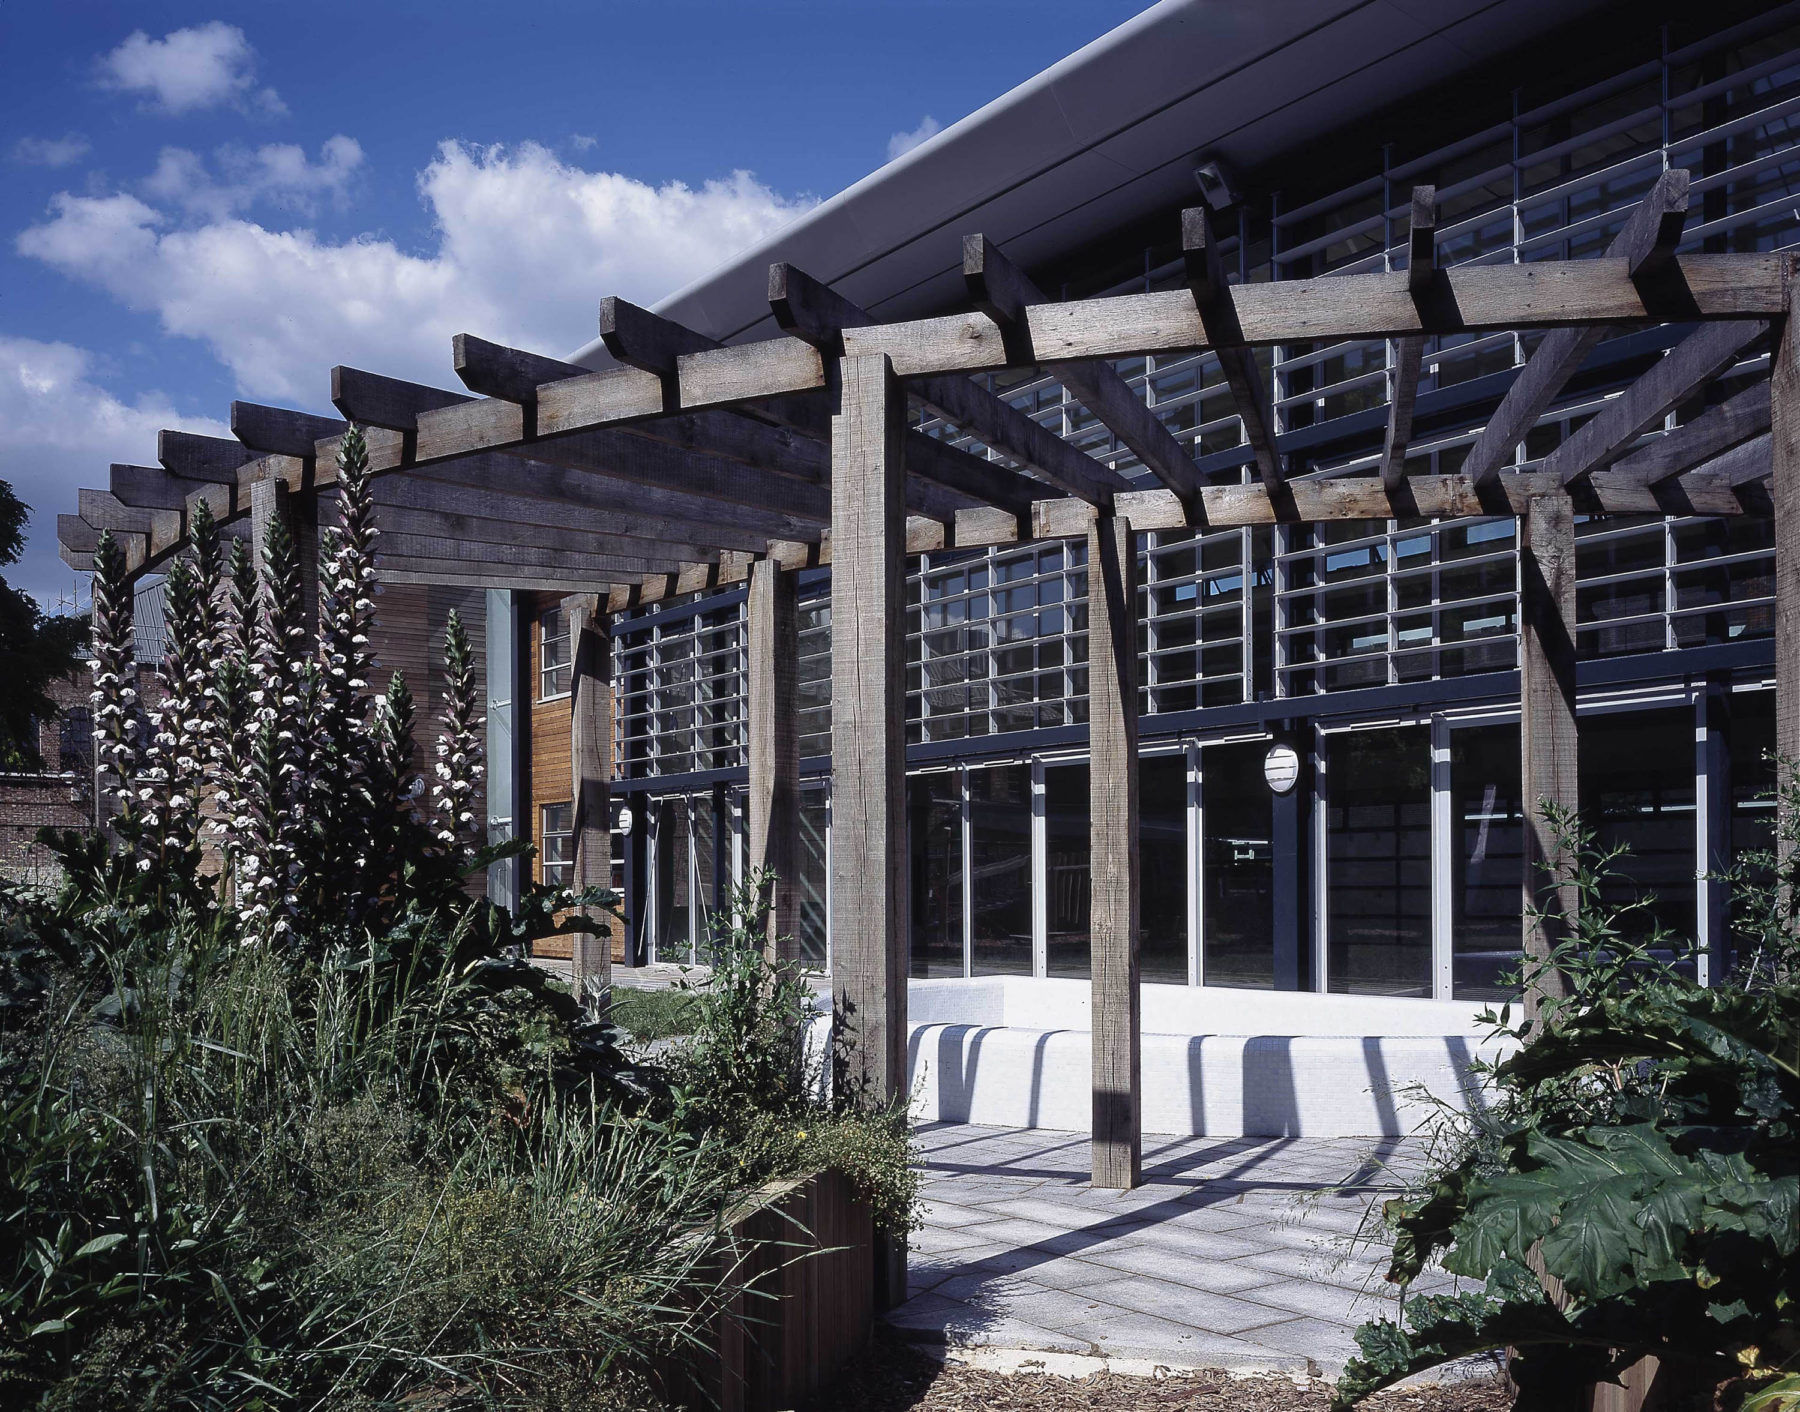 Attlee Community Centre 03 External Pergola Landscaping